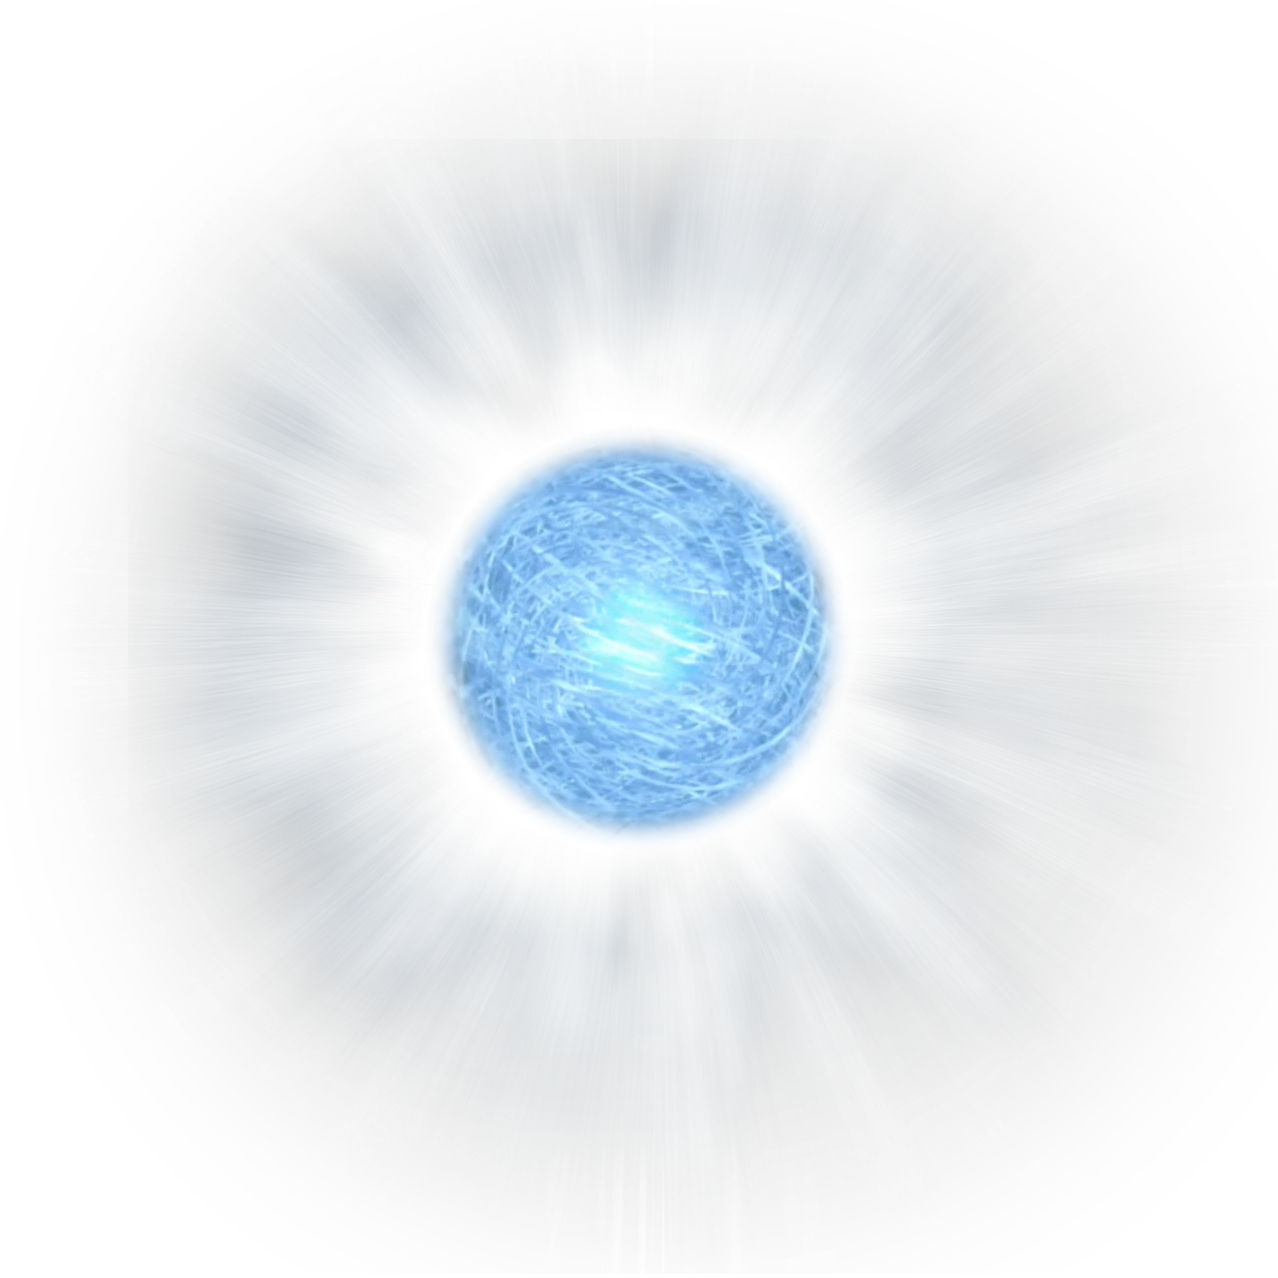 Arena Lights Gif: Baixar Renders Do Dimy: Render Da Esfera De Energia